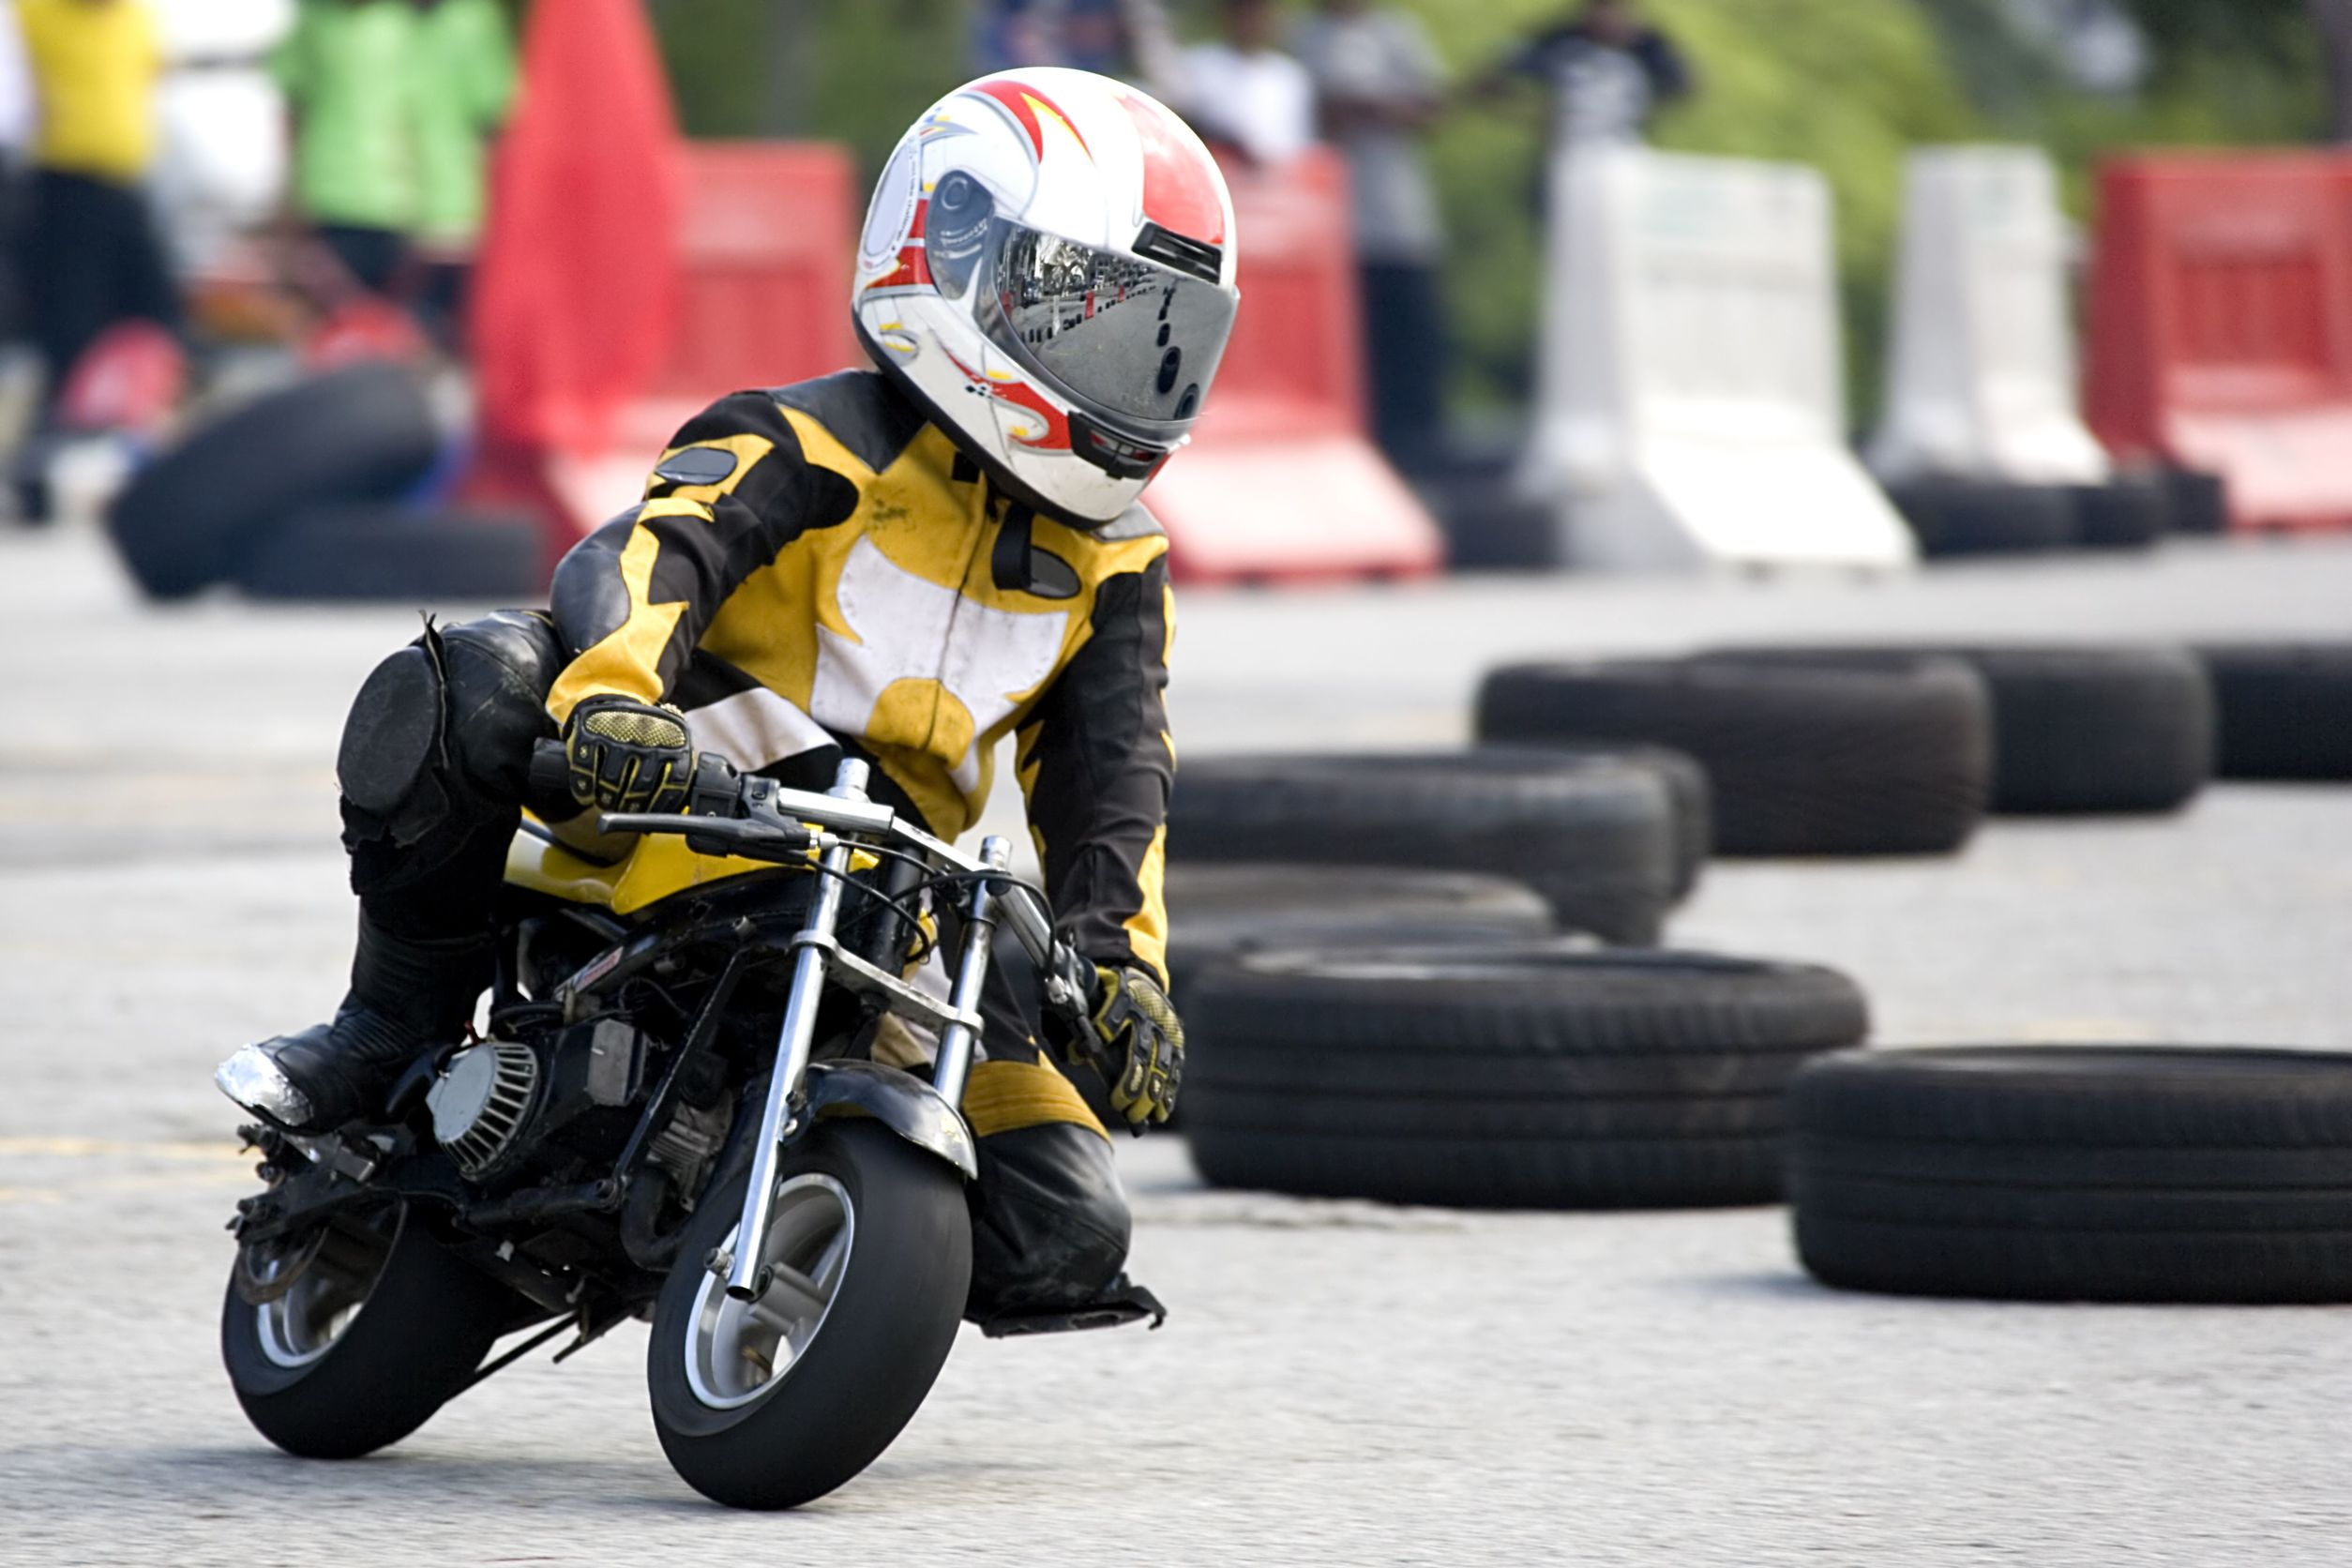 menino andando de moto